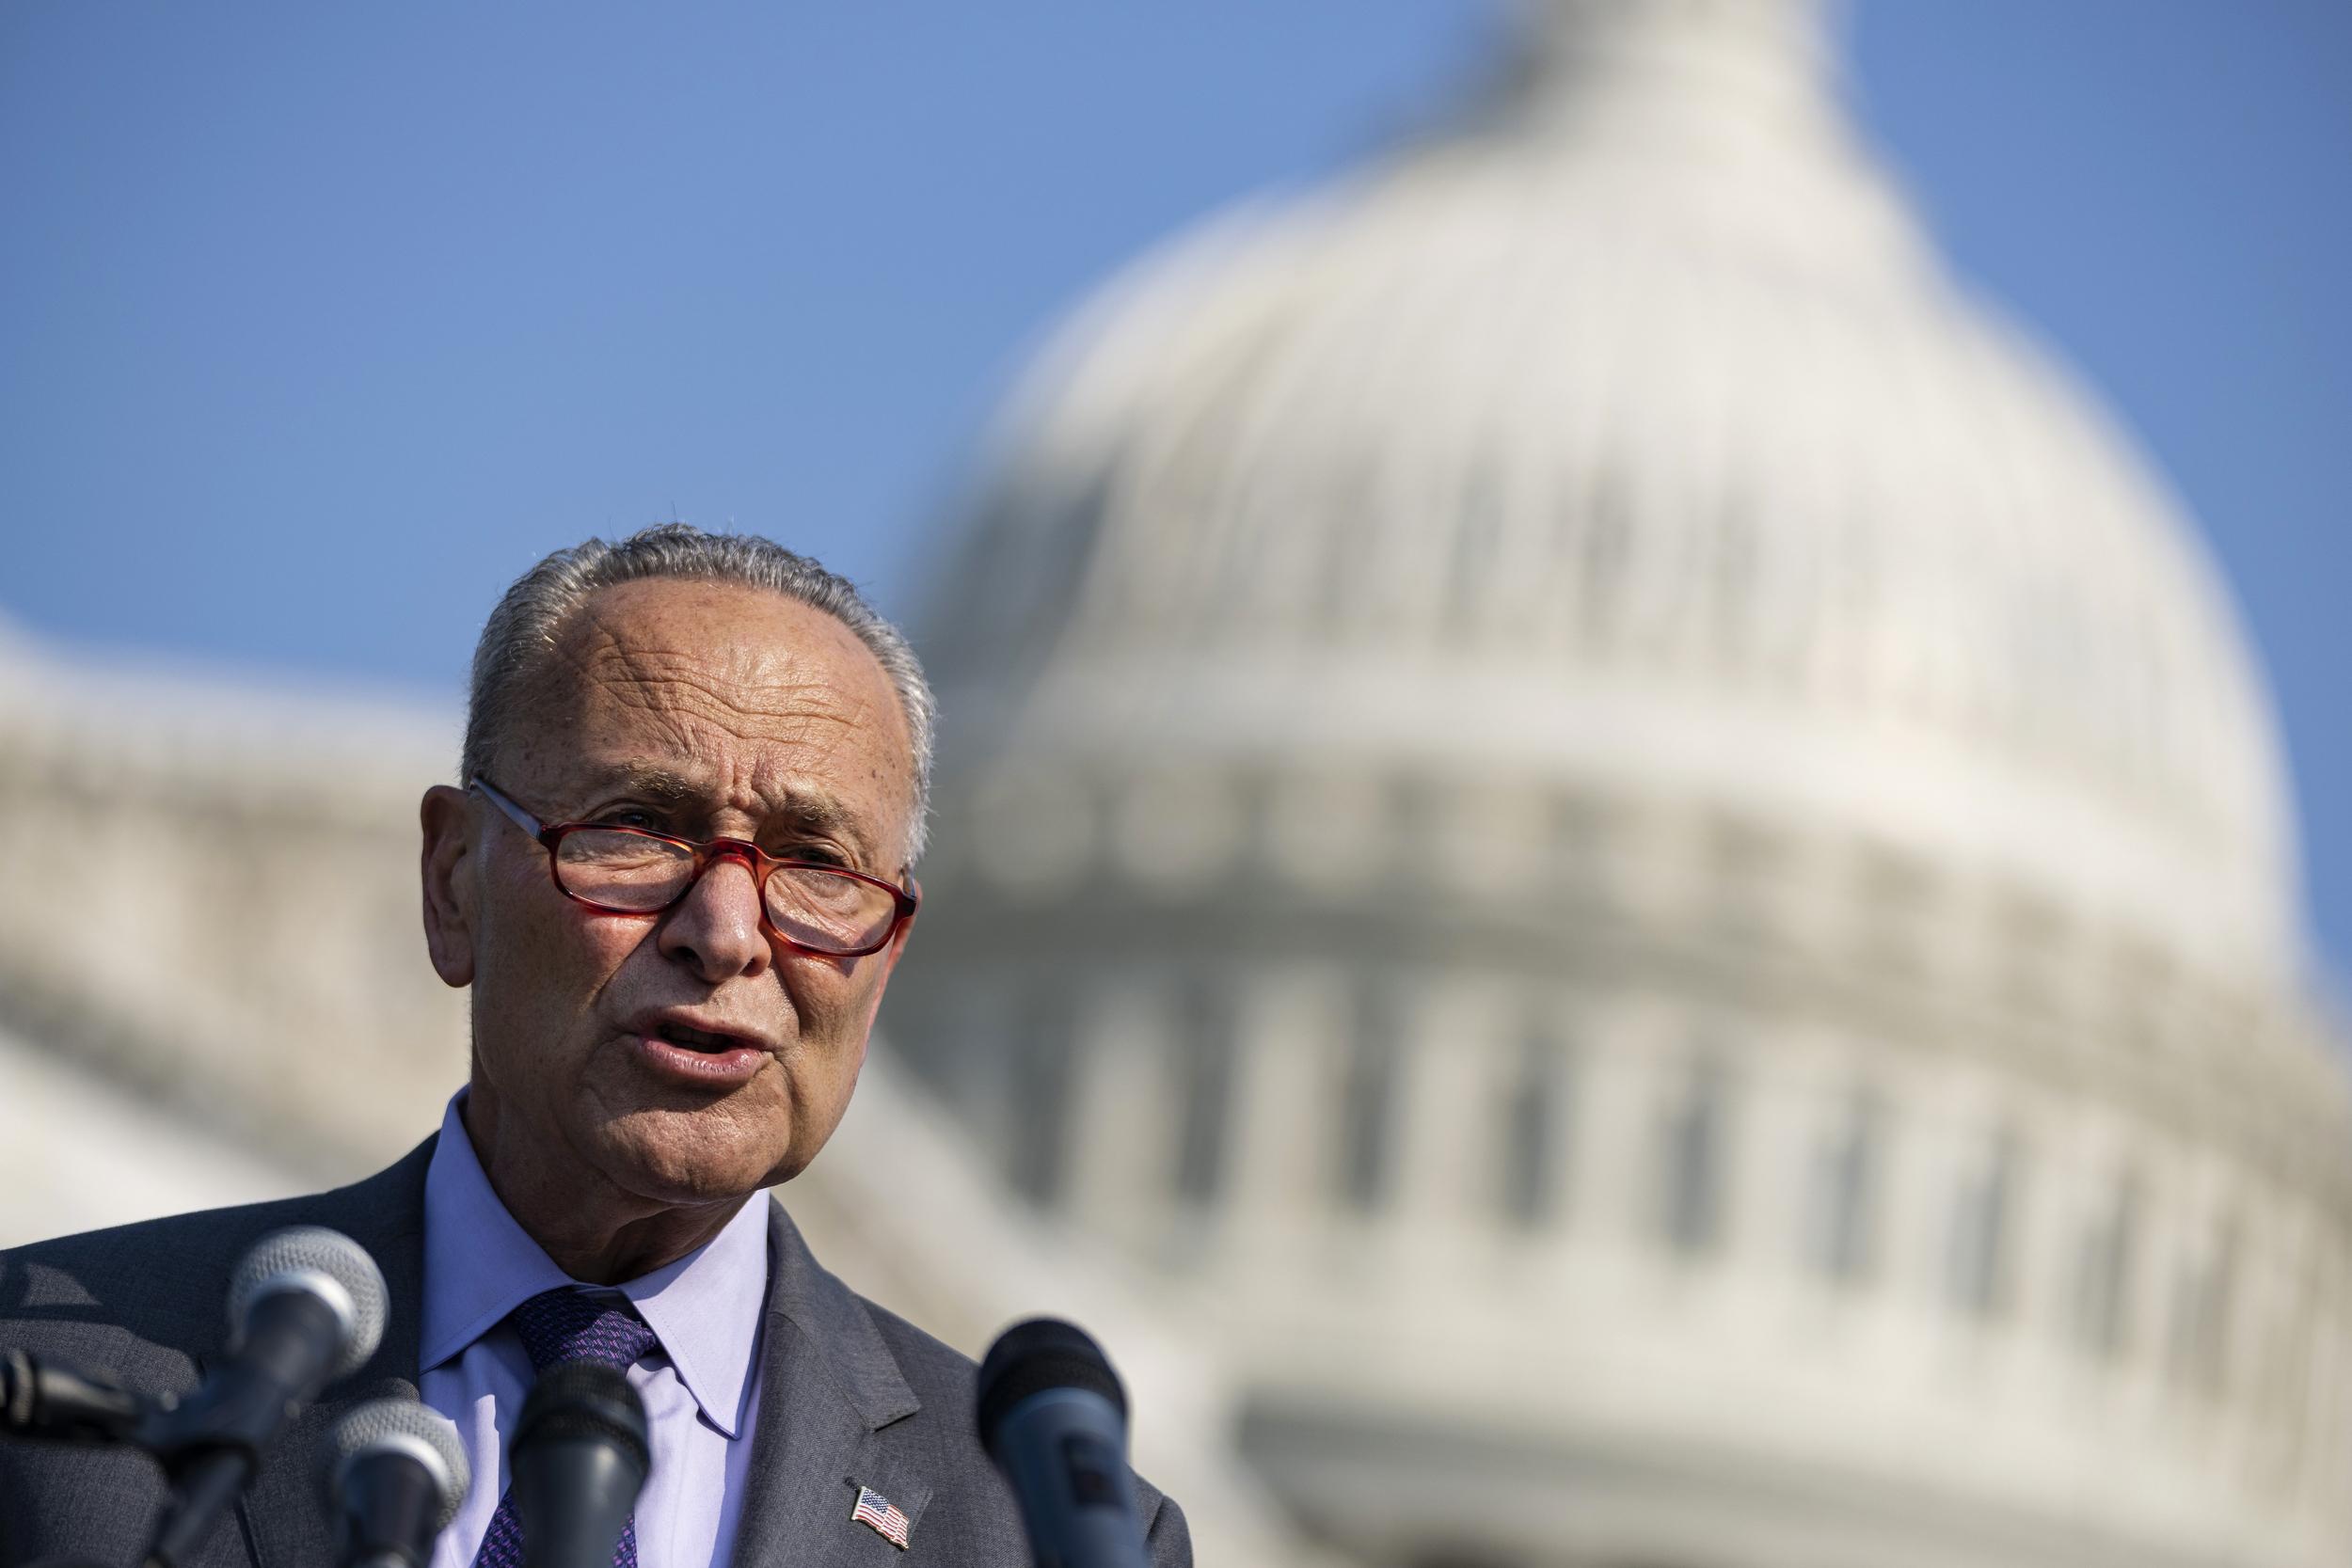 Democrats plow 'full speed ahead' on sweeping Biden budget, despite tensions